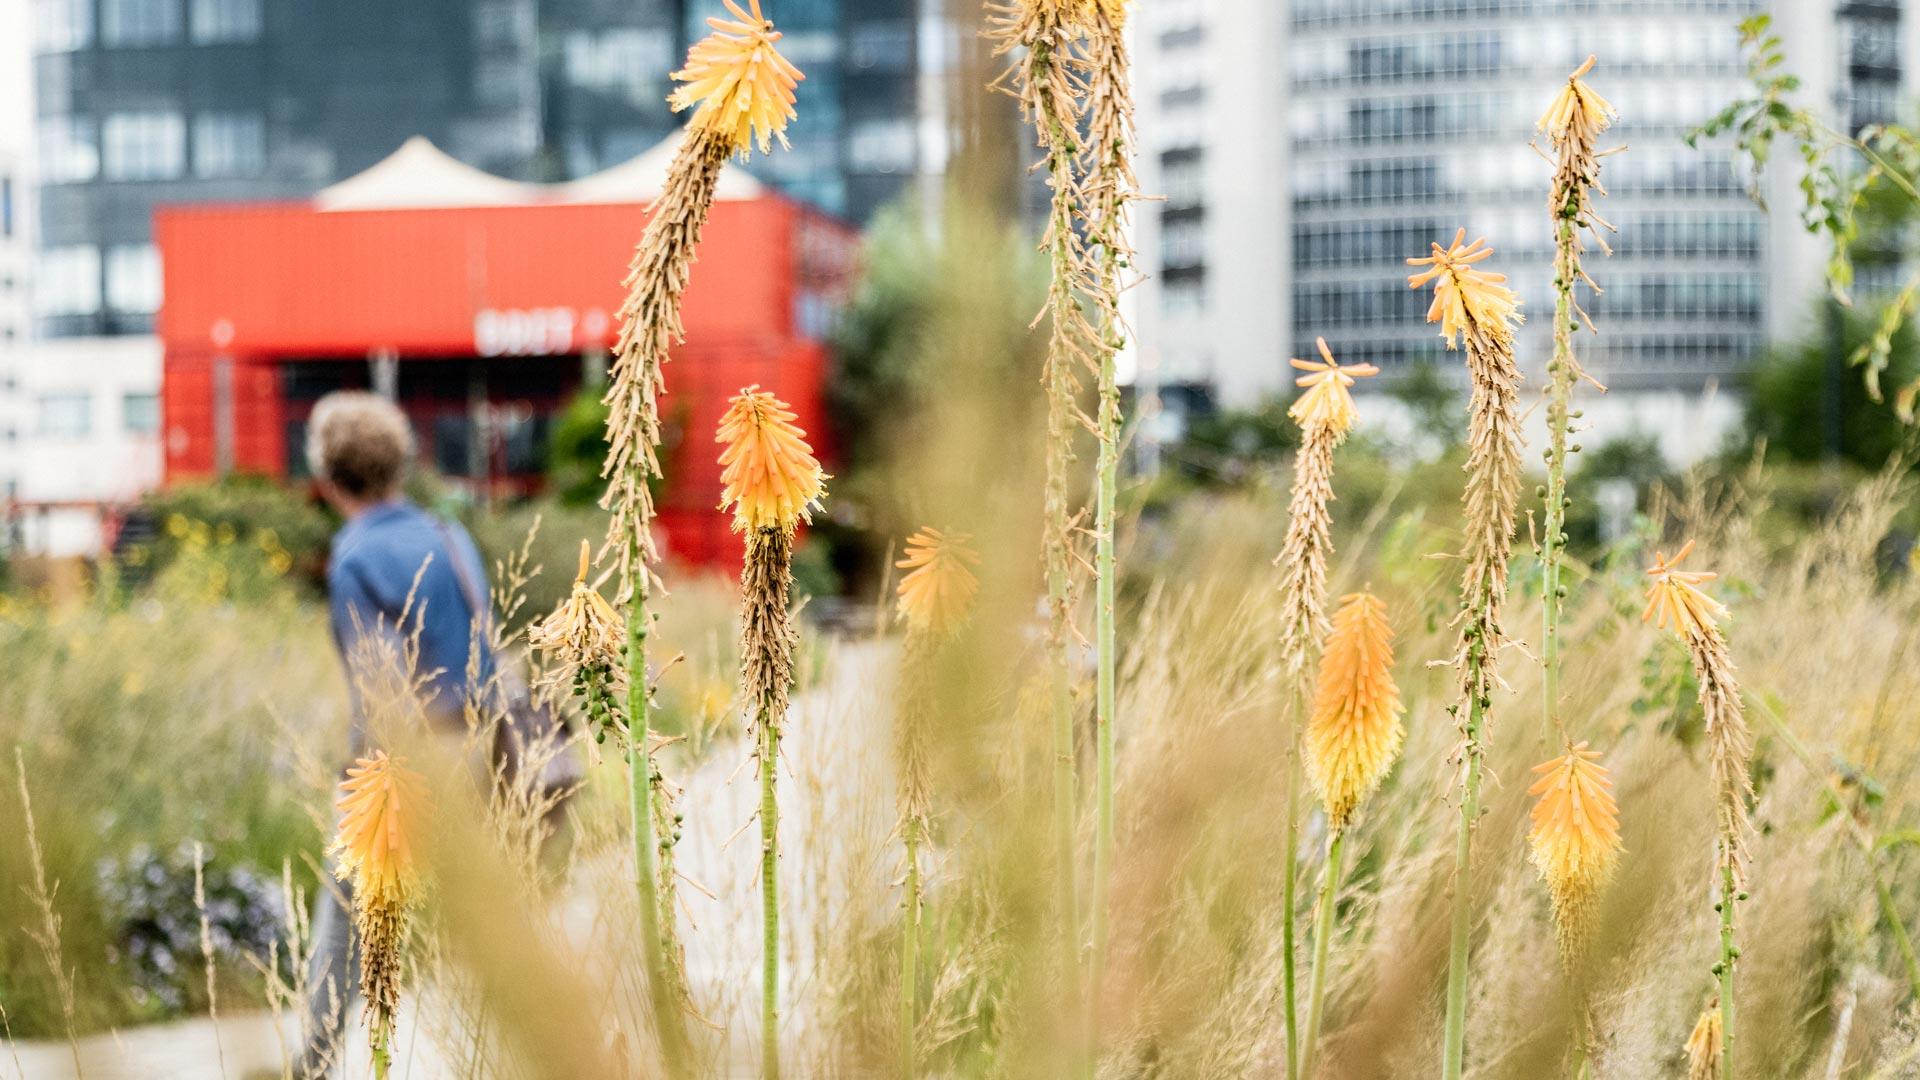 UPtown Sloterdijk - Foto - yoreM - werk